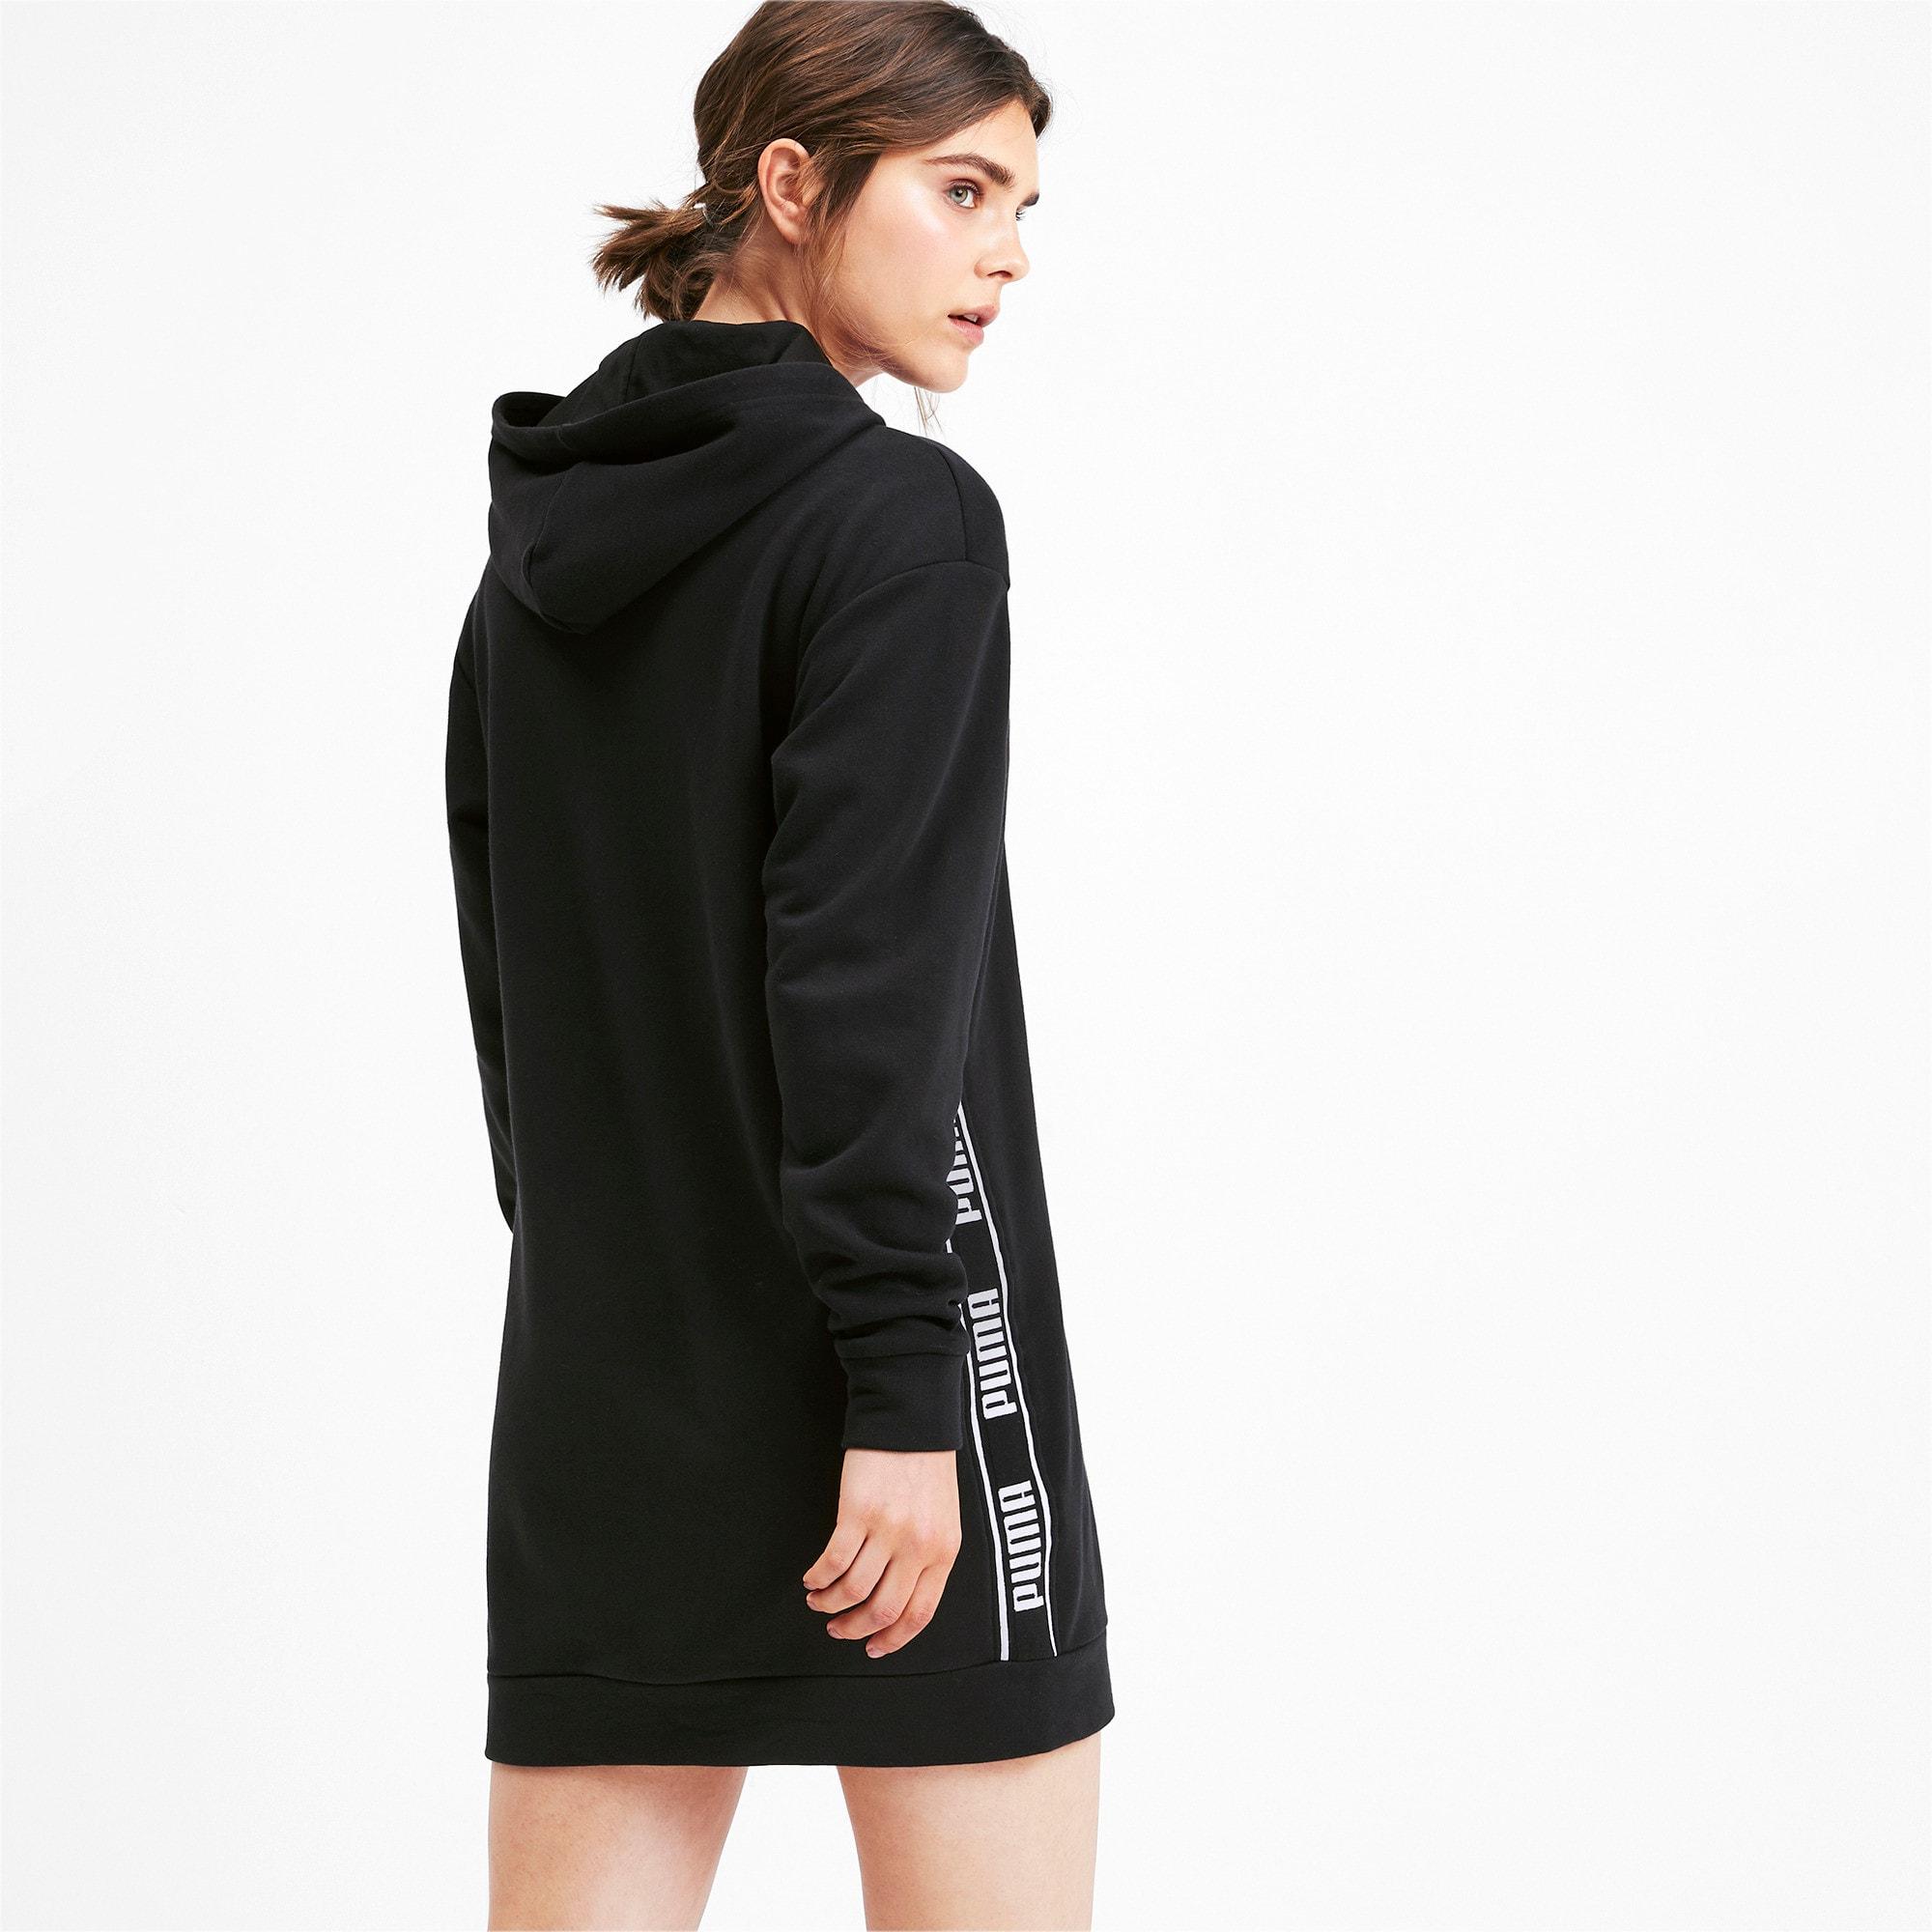 Thumbnail 3 of Amplified Women's Dress, Puma Black, medium